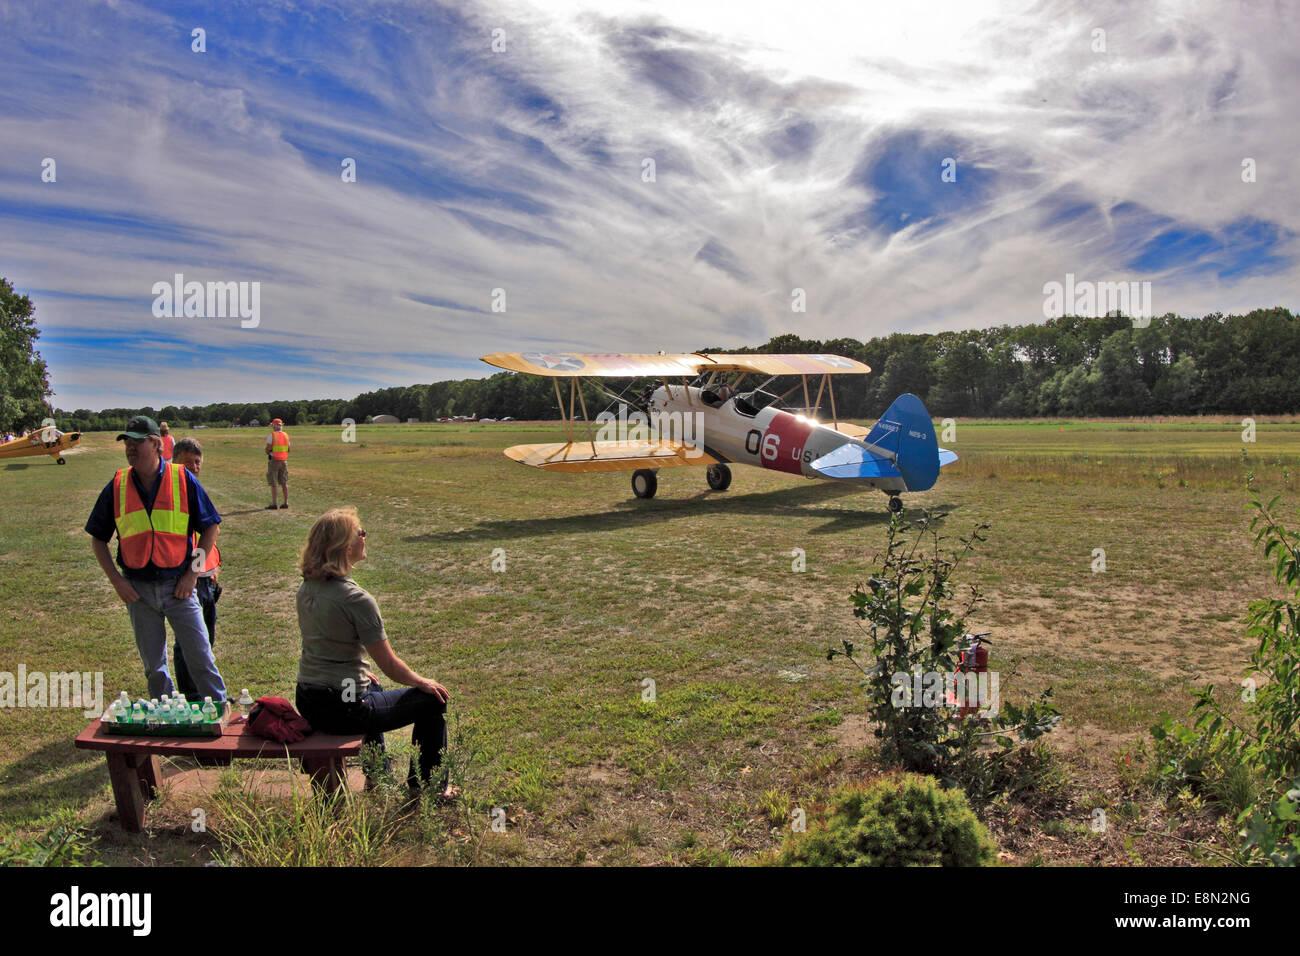 Bayport Aerodrome grass field airport Bayport Long Island New York - Stock Image